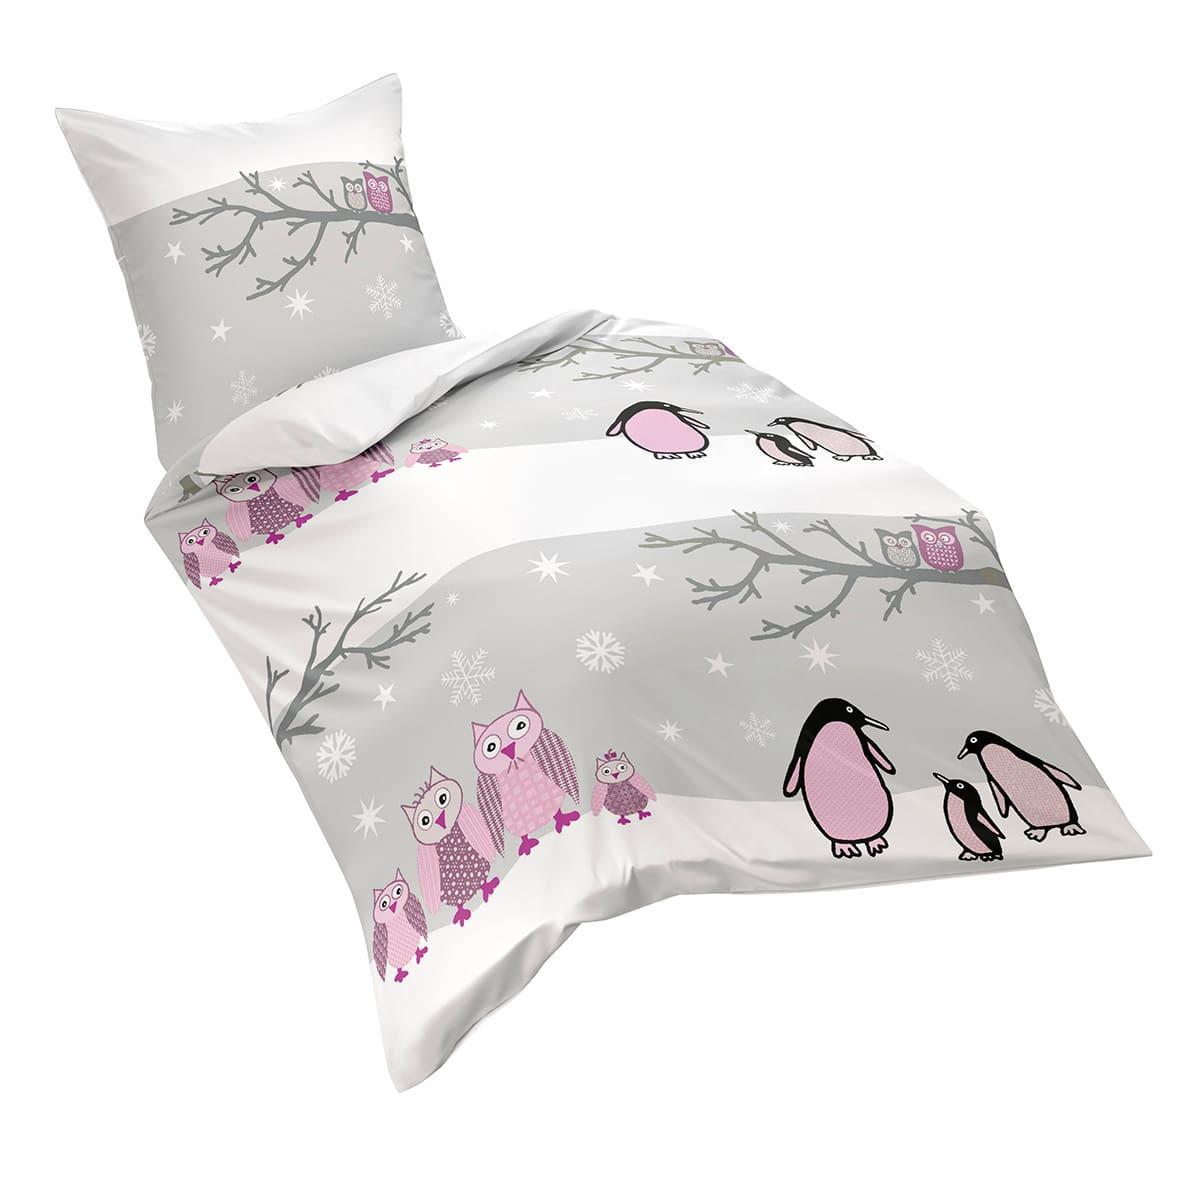 fleuresse biber bettw sche davos eule g nstig online kaufen bei bettwaren shop. Black Bedroom Furniture Sets. Home Design Ideas